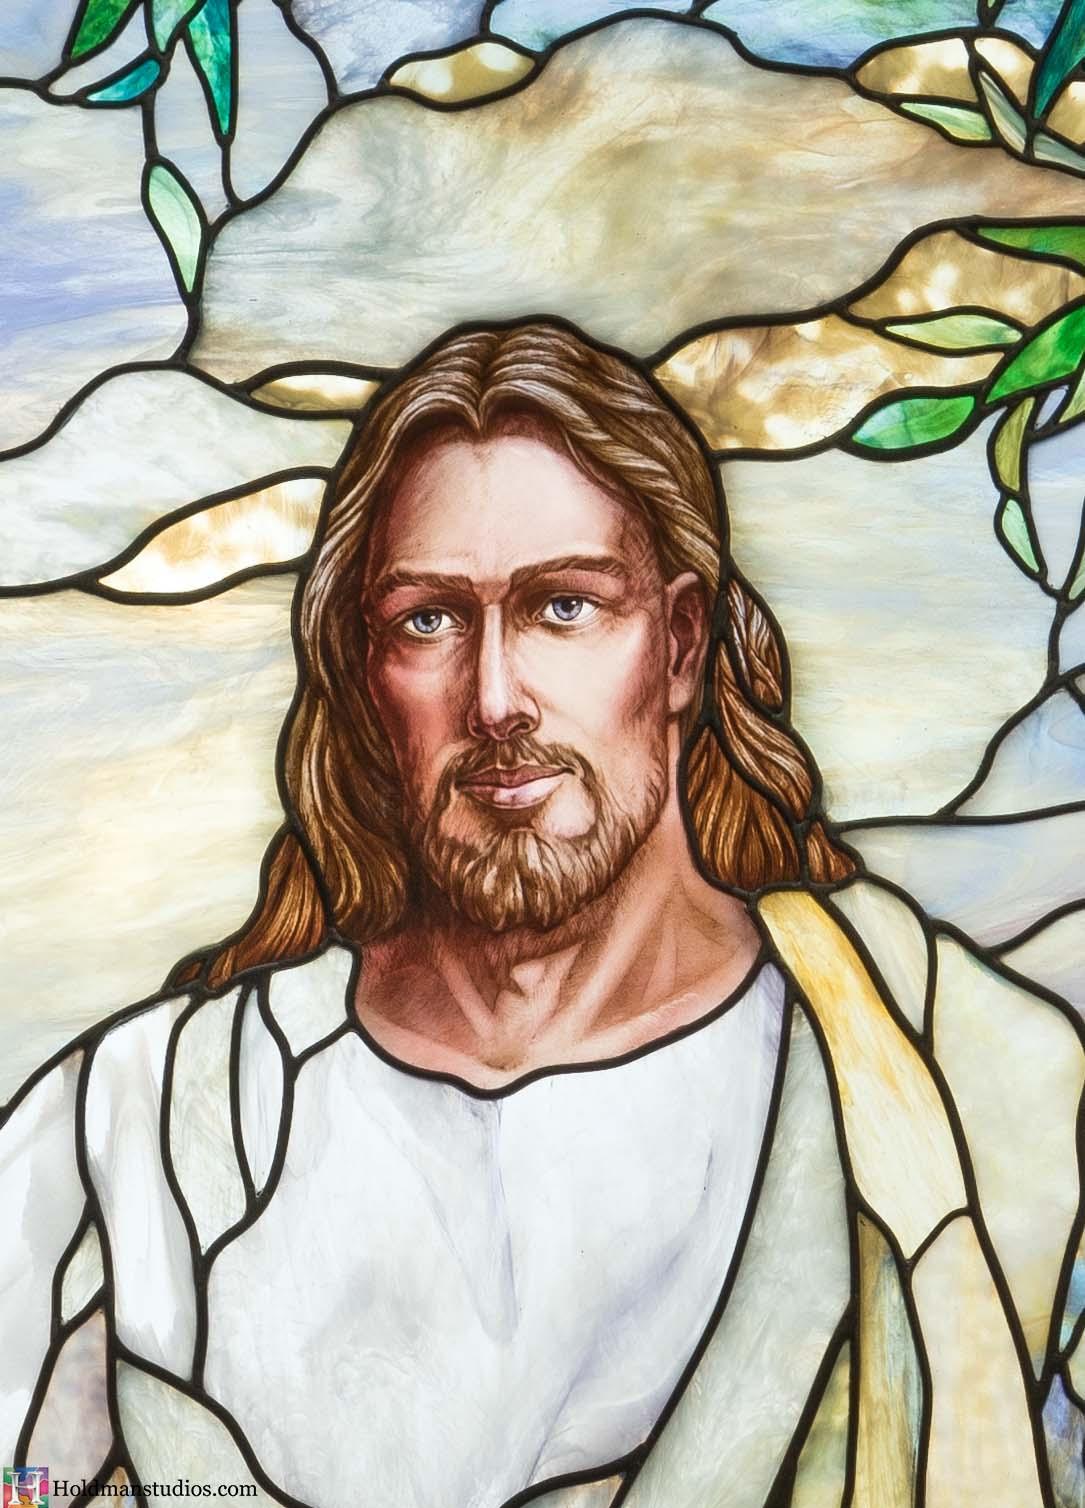 Holdman-Studios-Stained-Glass-Paris-LDS-Temple-Welcoming-Center-Jesus-Christ-Sky-Window-Crop.jpg